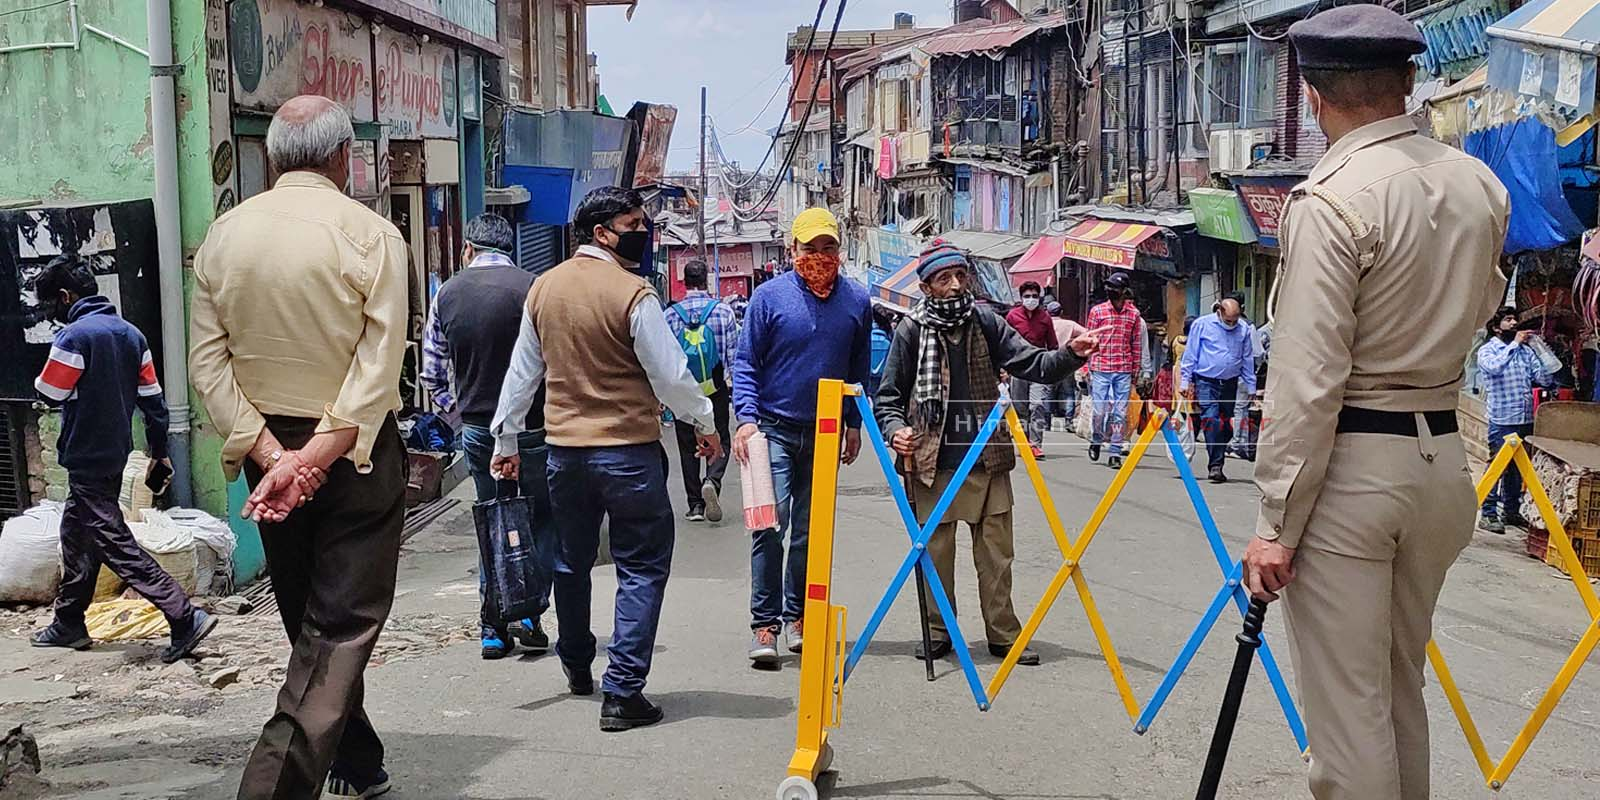 Himachal PRadesh New Cufew rules form June 1